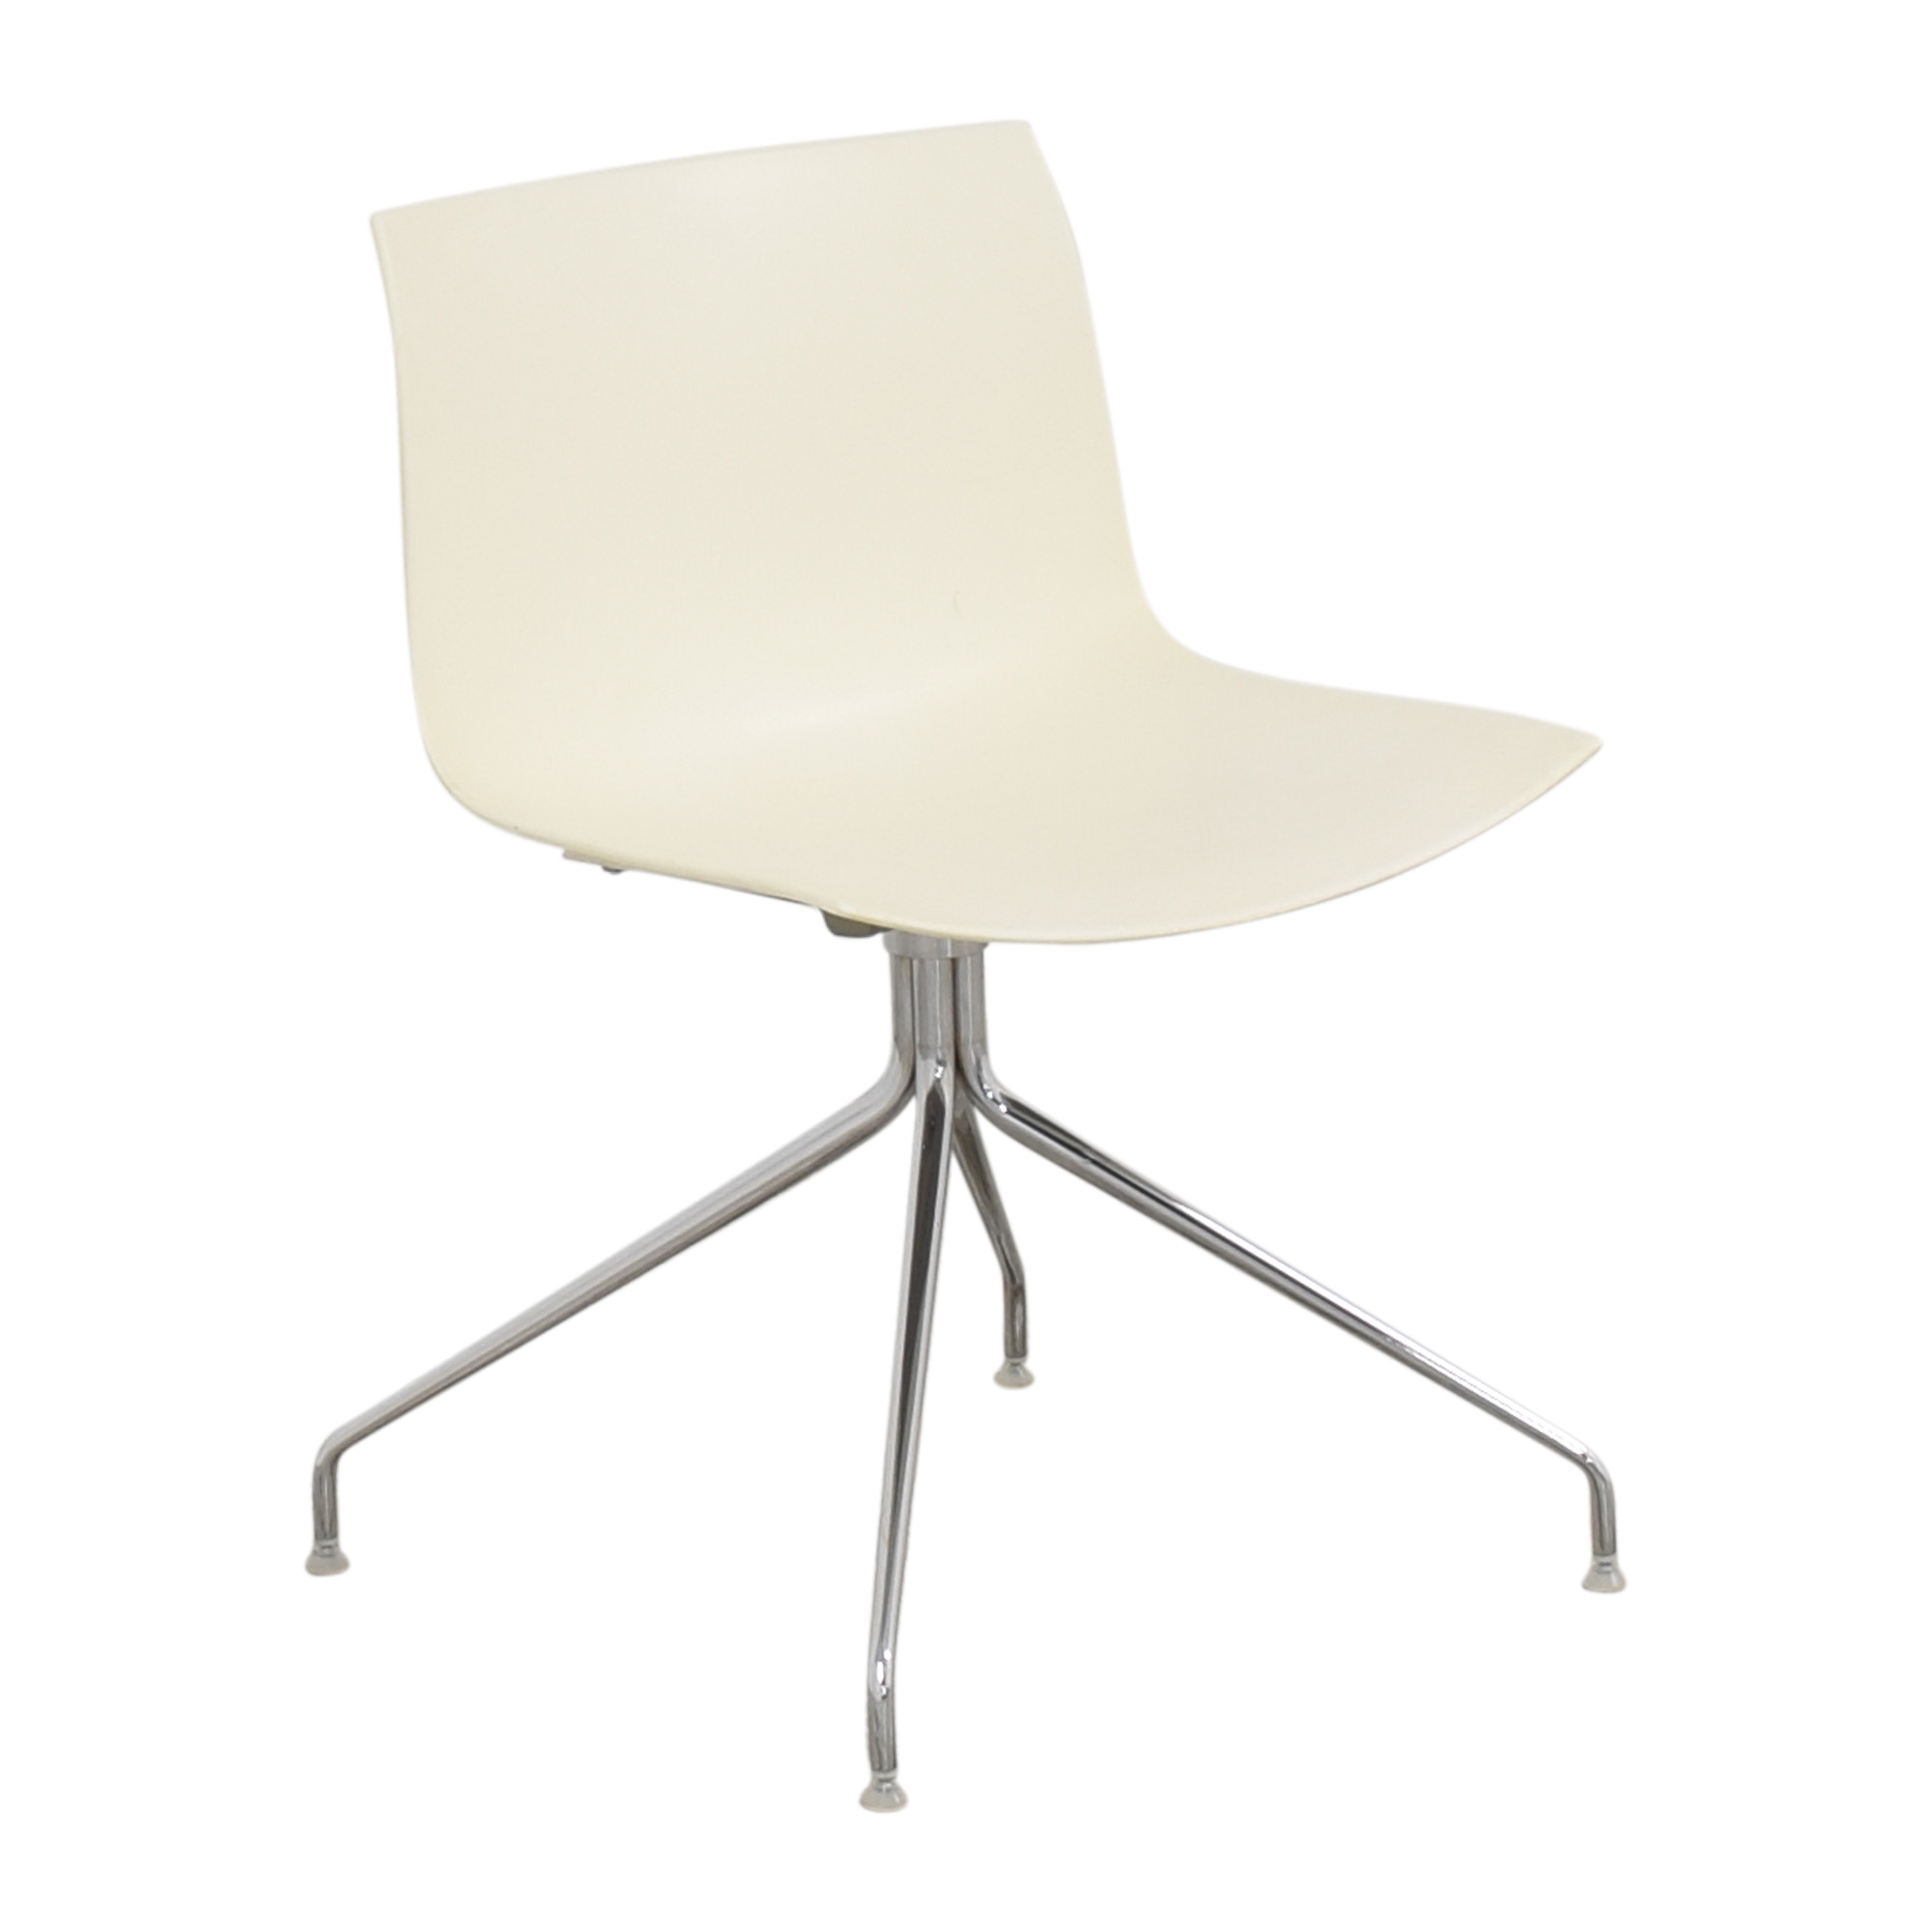 Arper Arper Catifa 46 Trestle Swivel Chair ct